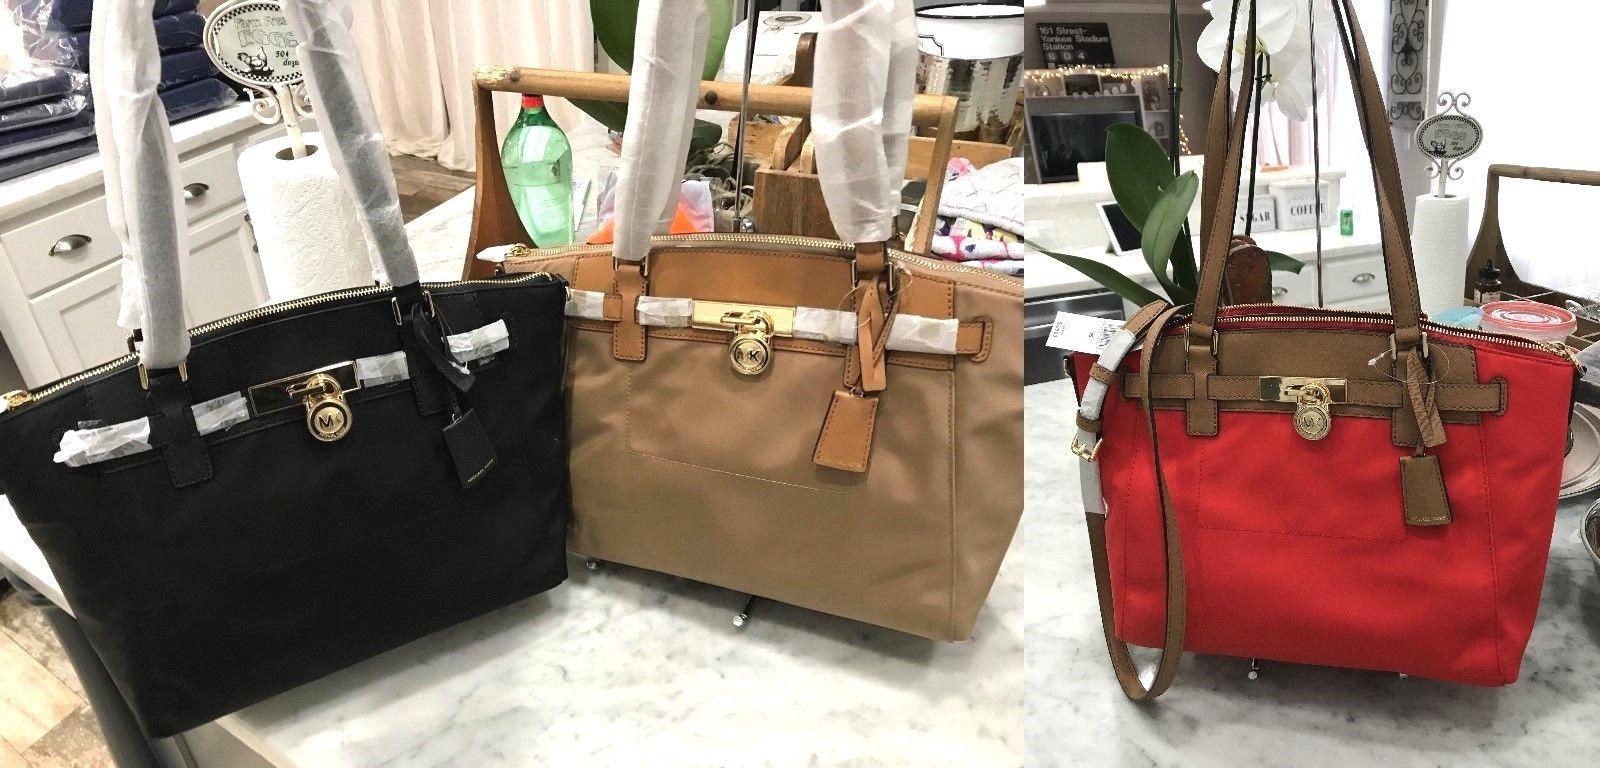 bece81eef54d0c S l1600. S l1600. Previous. Michael Kors Hamilton Traveler Large Nylon &  Leather Convertible Top Zip Satchel